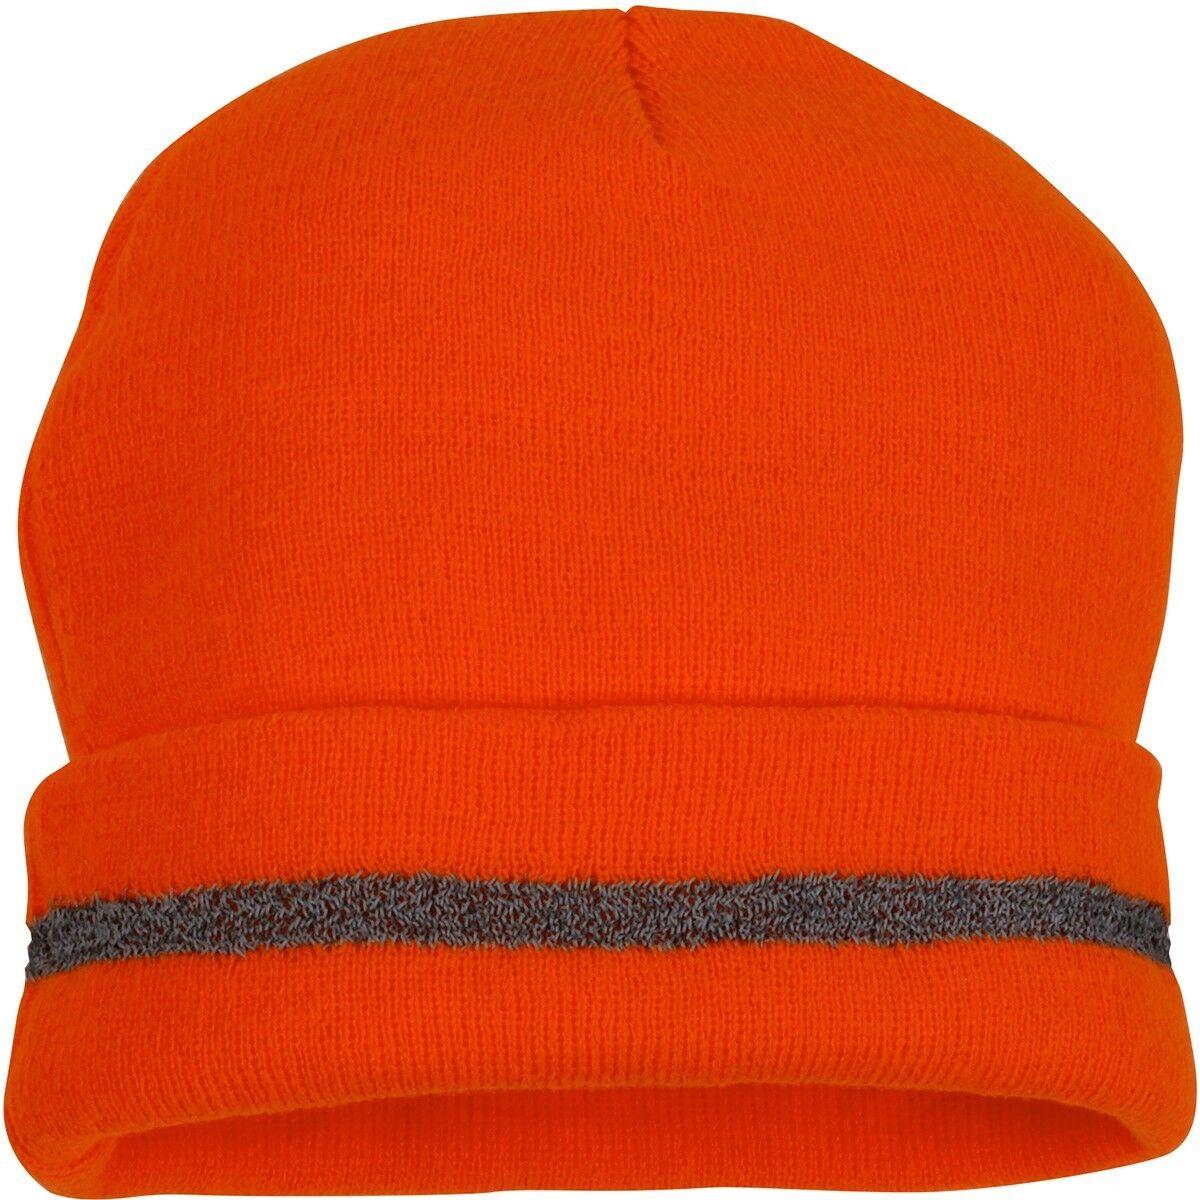 Pyramex RH110 Hi-Vis Reflective Beanie W/Reflective Stripe Yellow&Orange- 1 Size Clothing, Shoes & Accessories